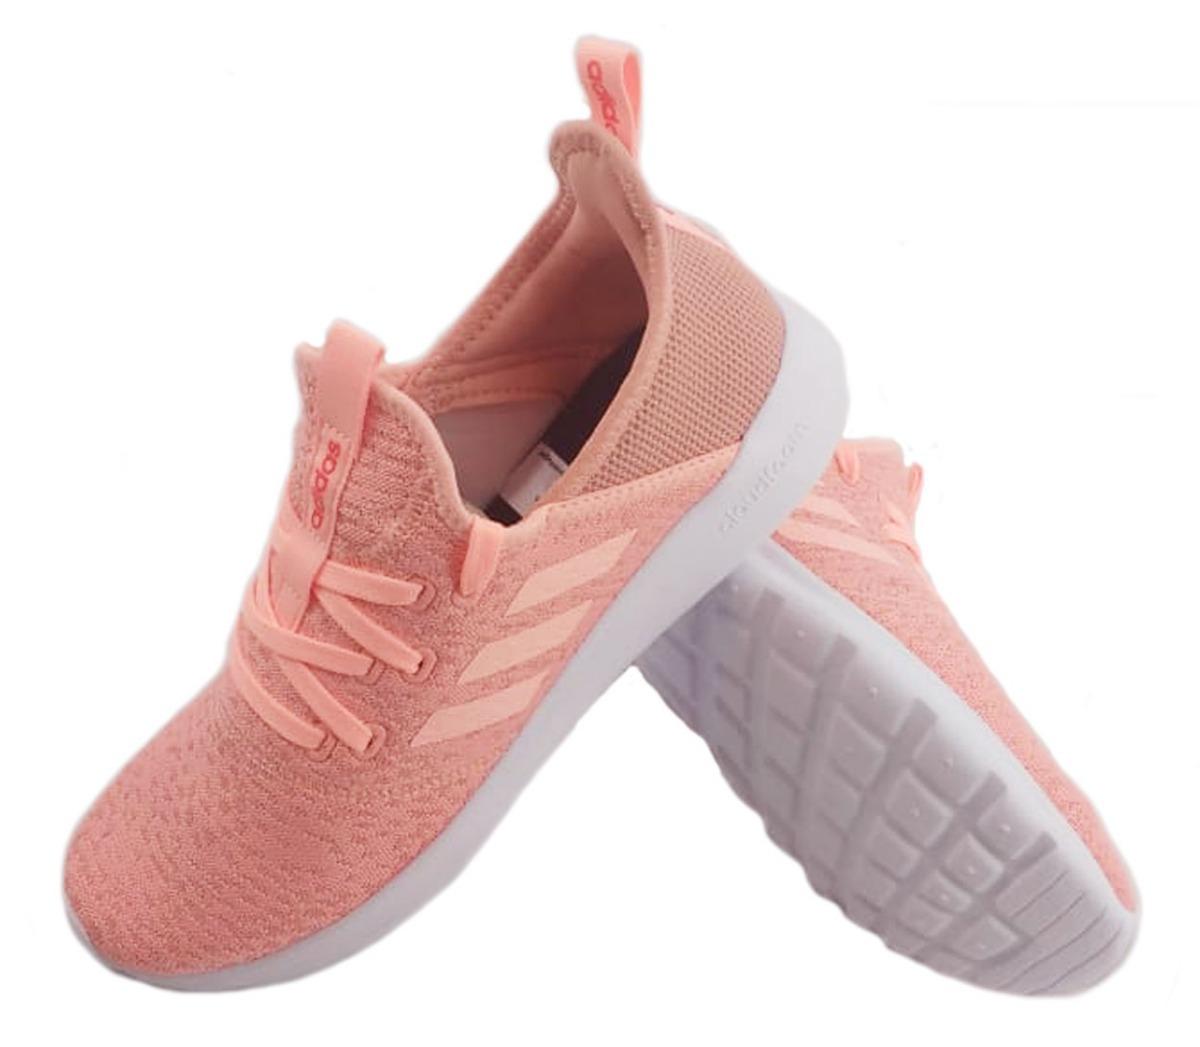 03924e1da1 zapatilla adidas cloudfoam pure rosa running mujer eezap. Cargando zoom.